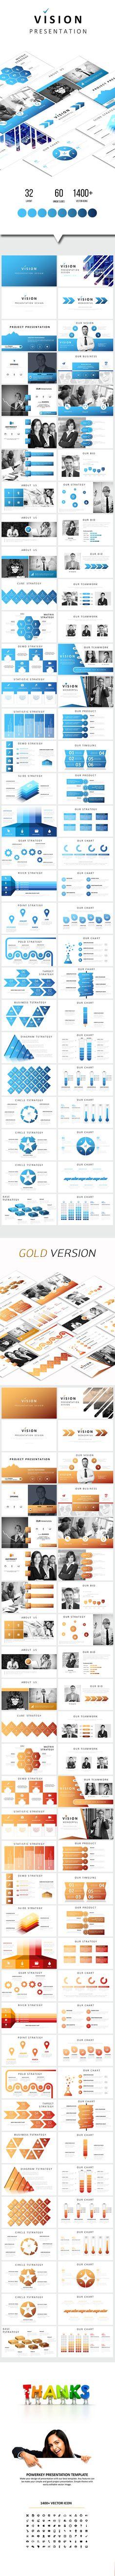 Premium Powerpoint Templates: VISION - Multipurpose Powerpoint Template Download here : https://graphicriver.net/item/vision-multipurpose-powerpoint-template/19663843?ref=powerkey